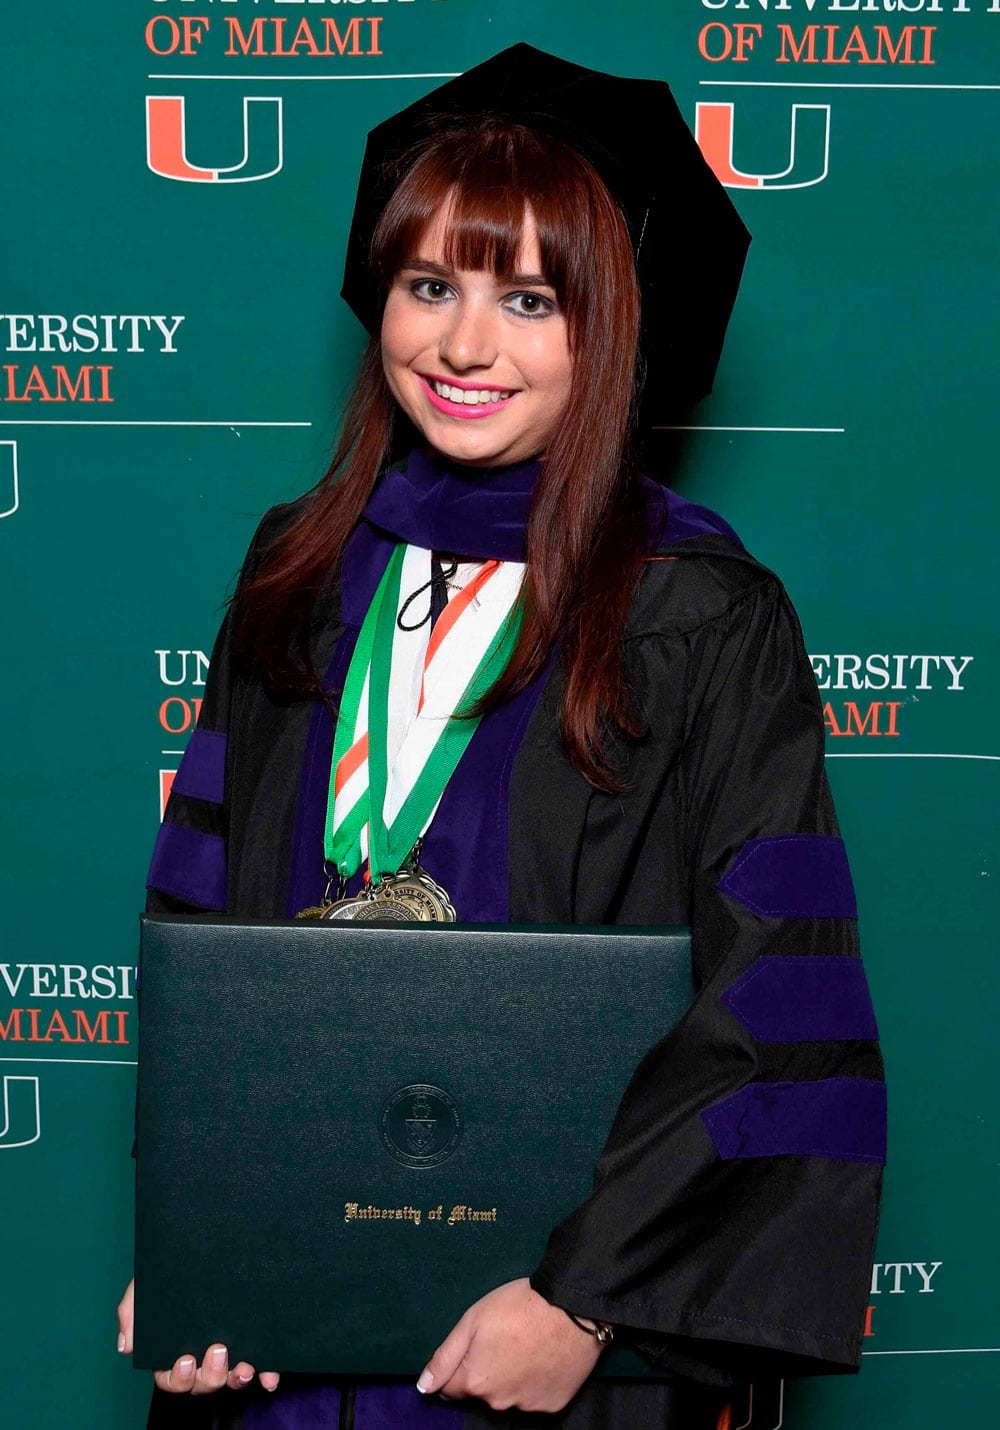 Haley Moss Graduada abogada autismo